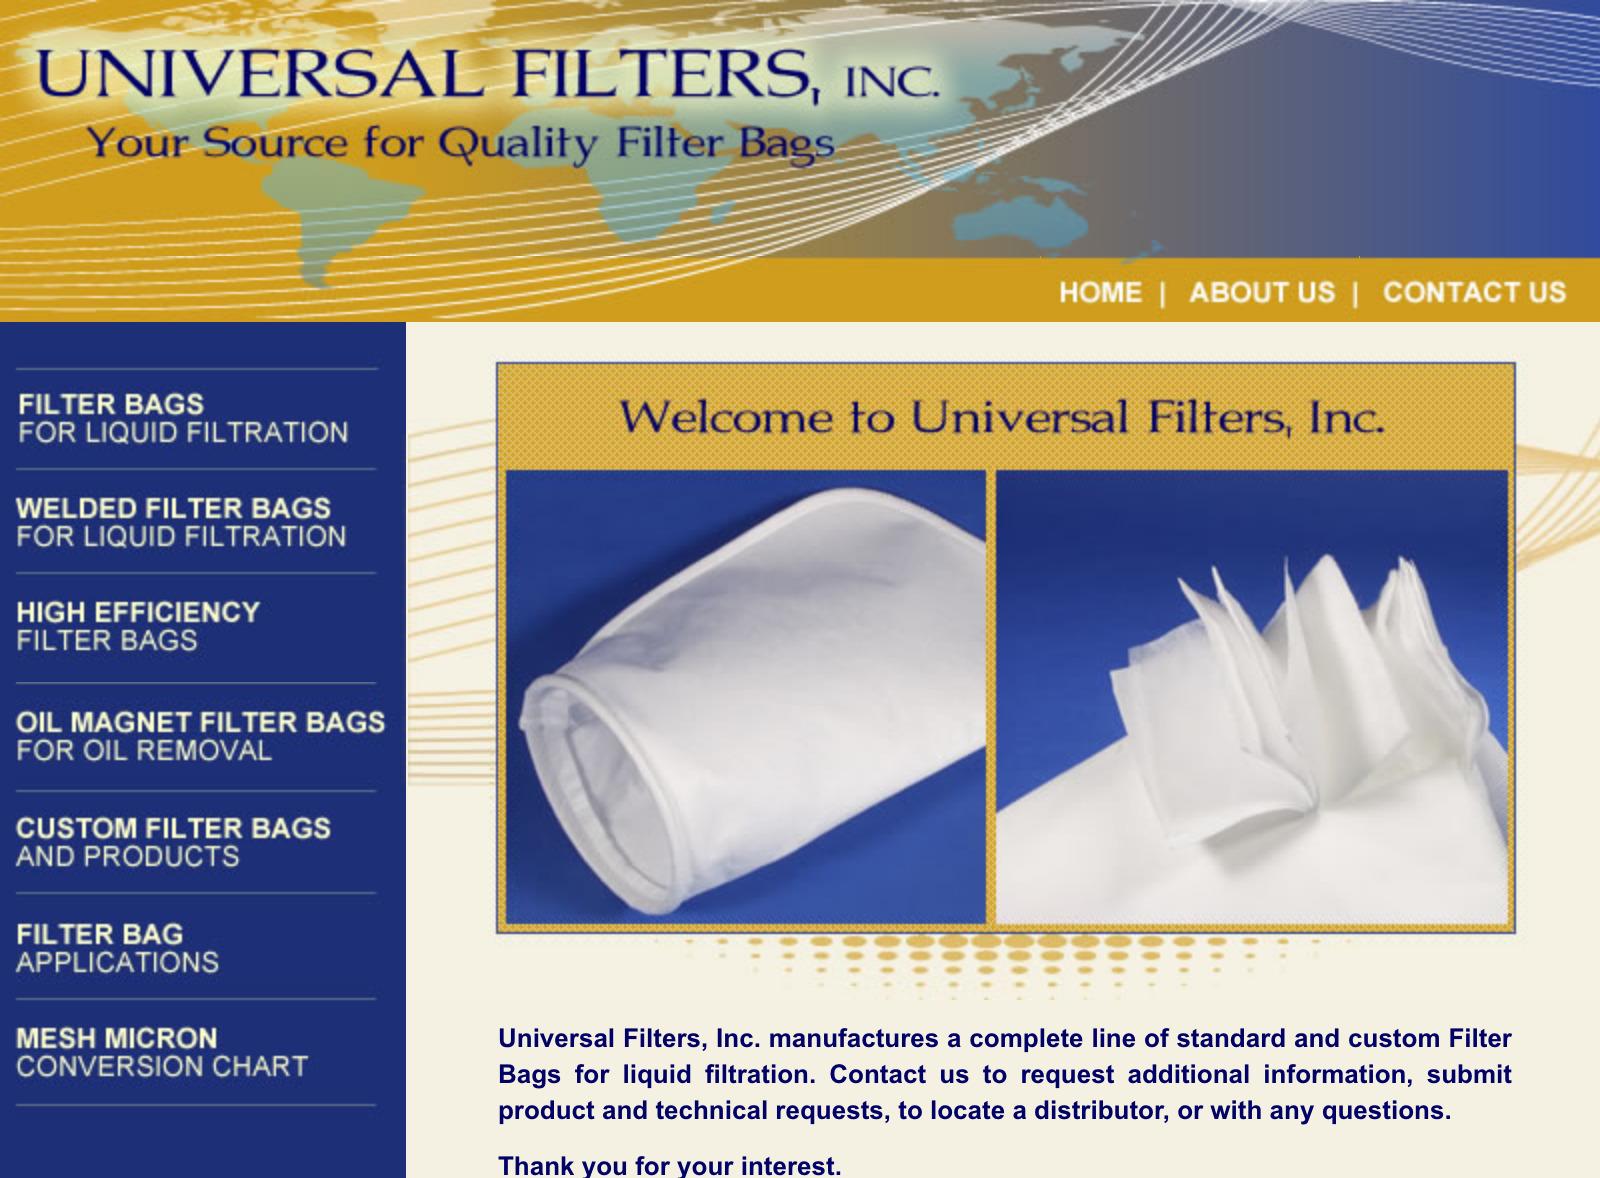 Screenshot_2019-01-07 UNIVERSAL FILTERS Filter Bags for Liquid Filtration.jpg